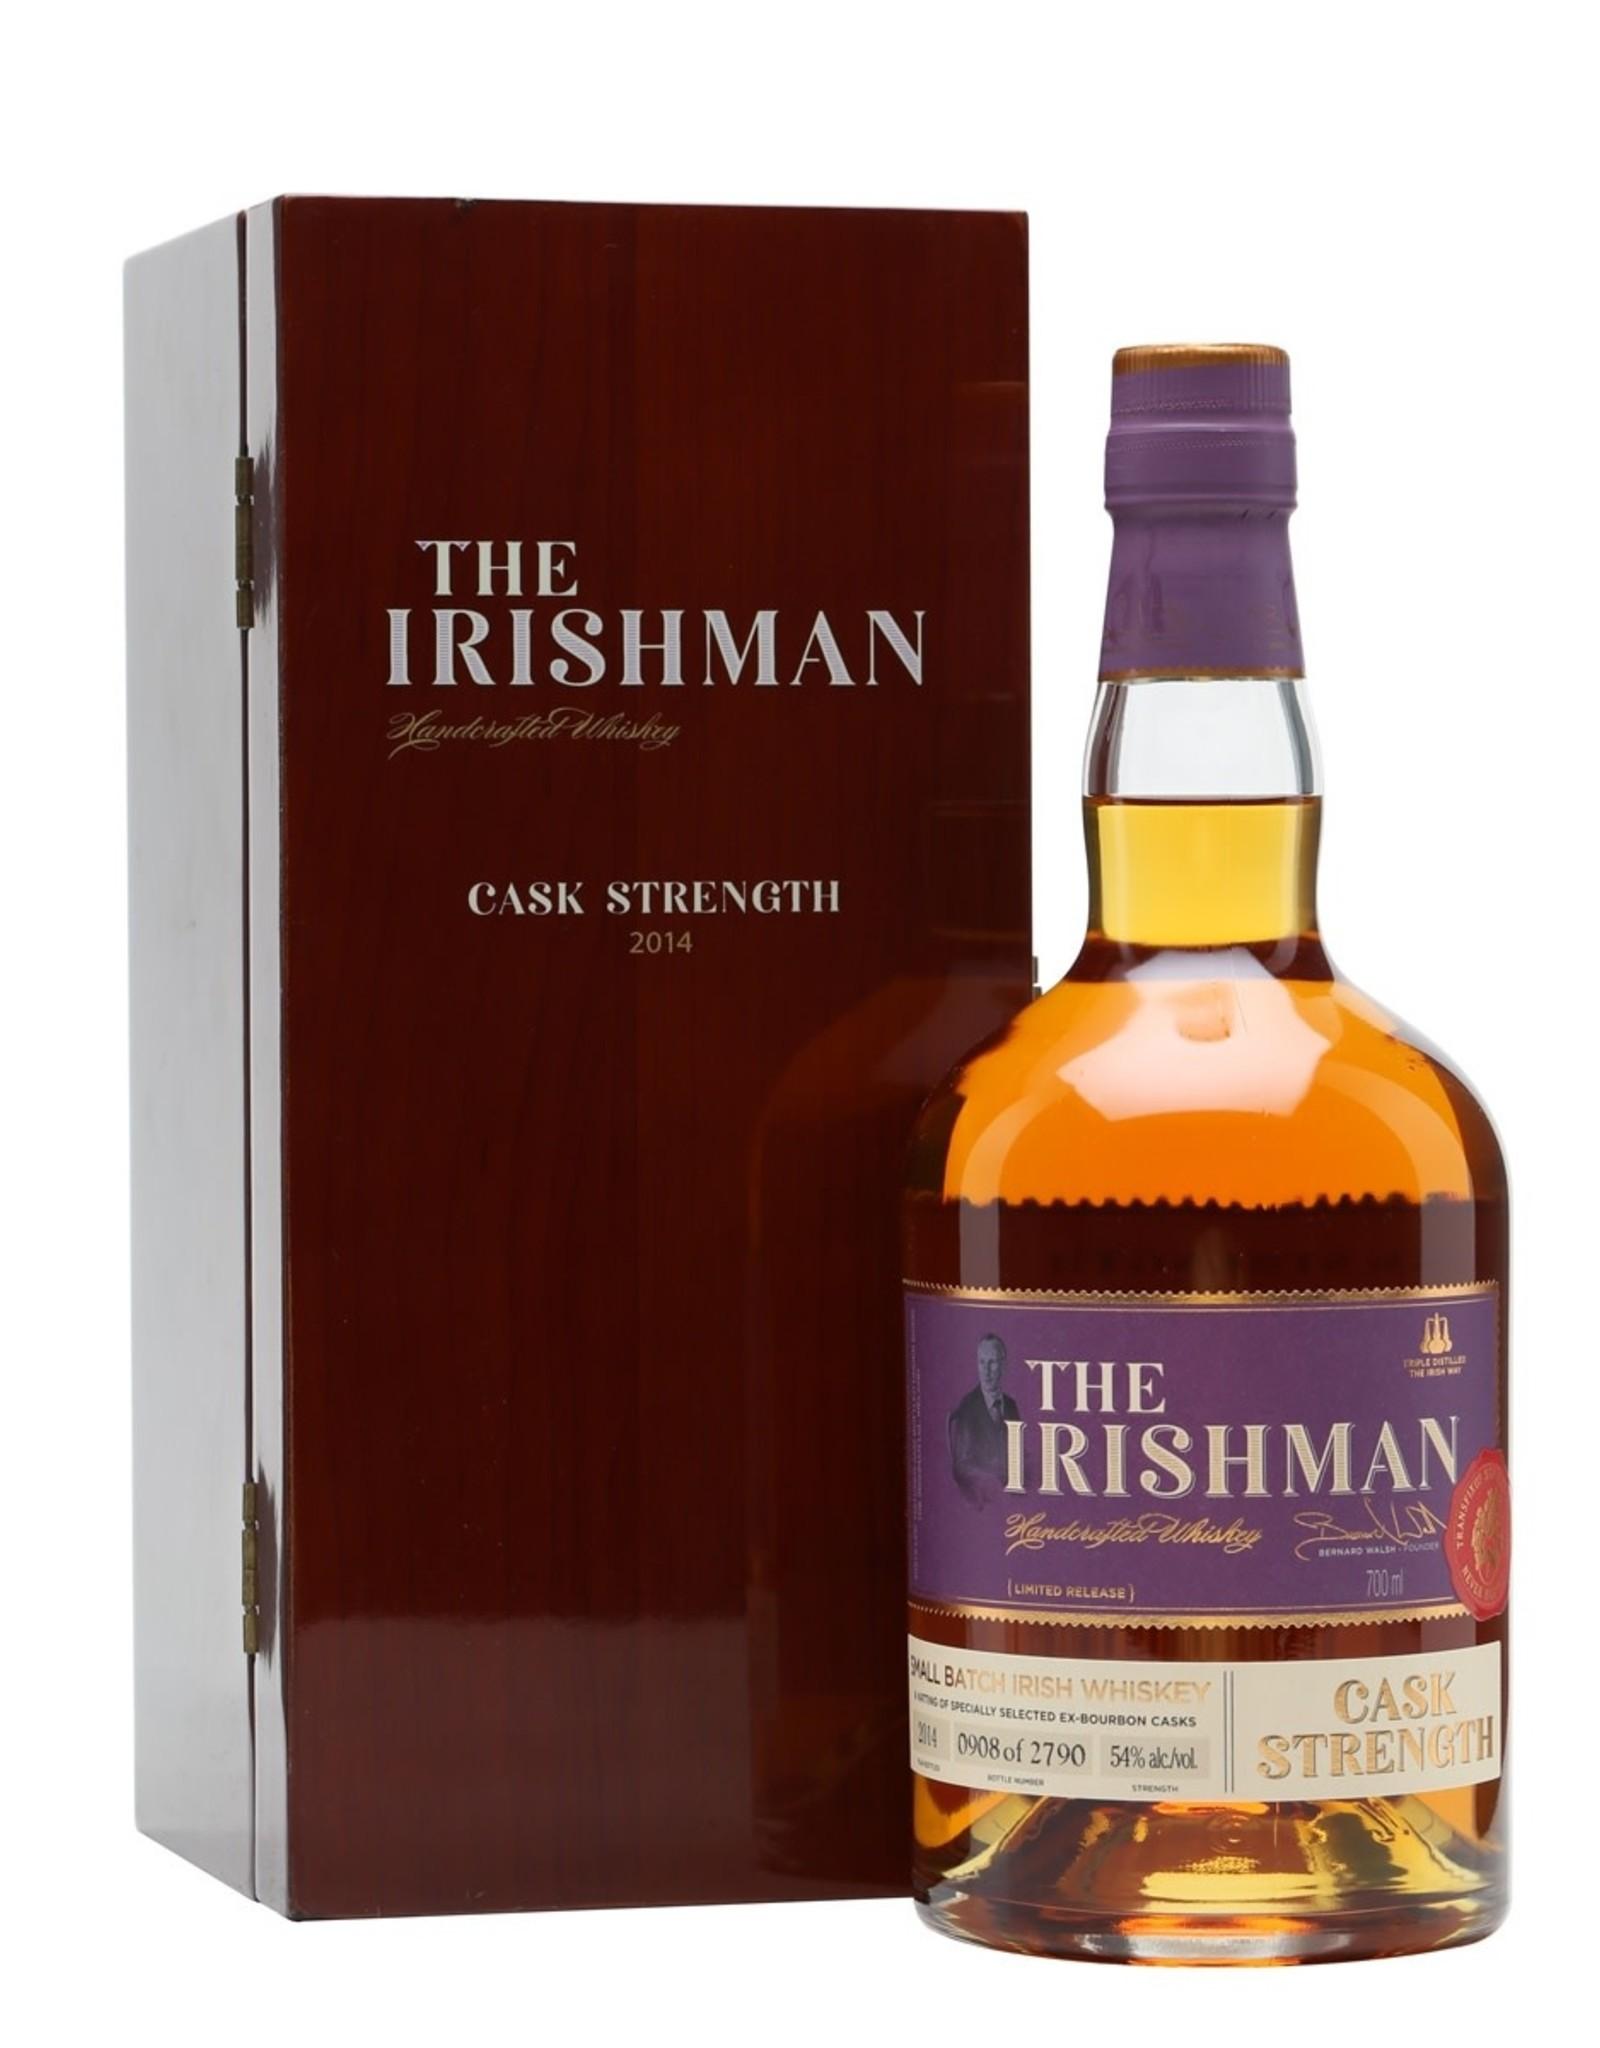 The Irishman Cask Strength Limited Edition 2014